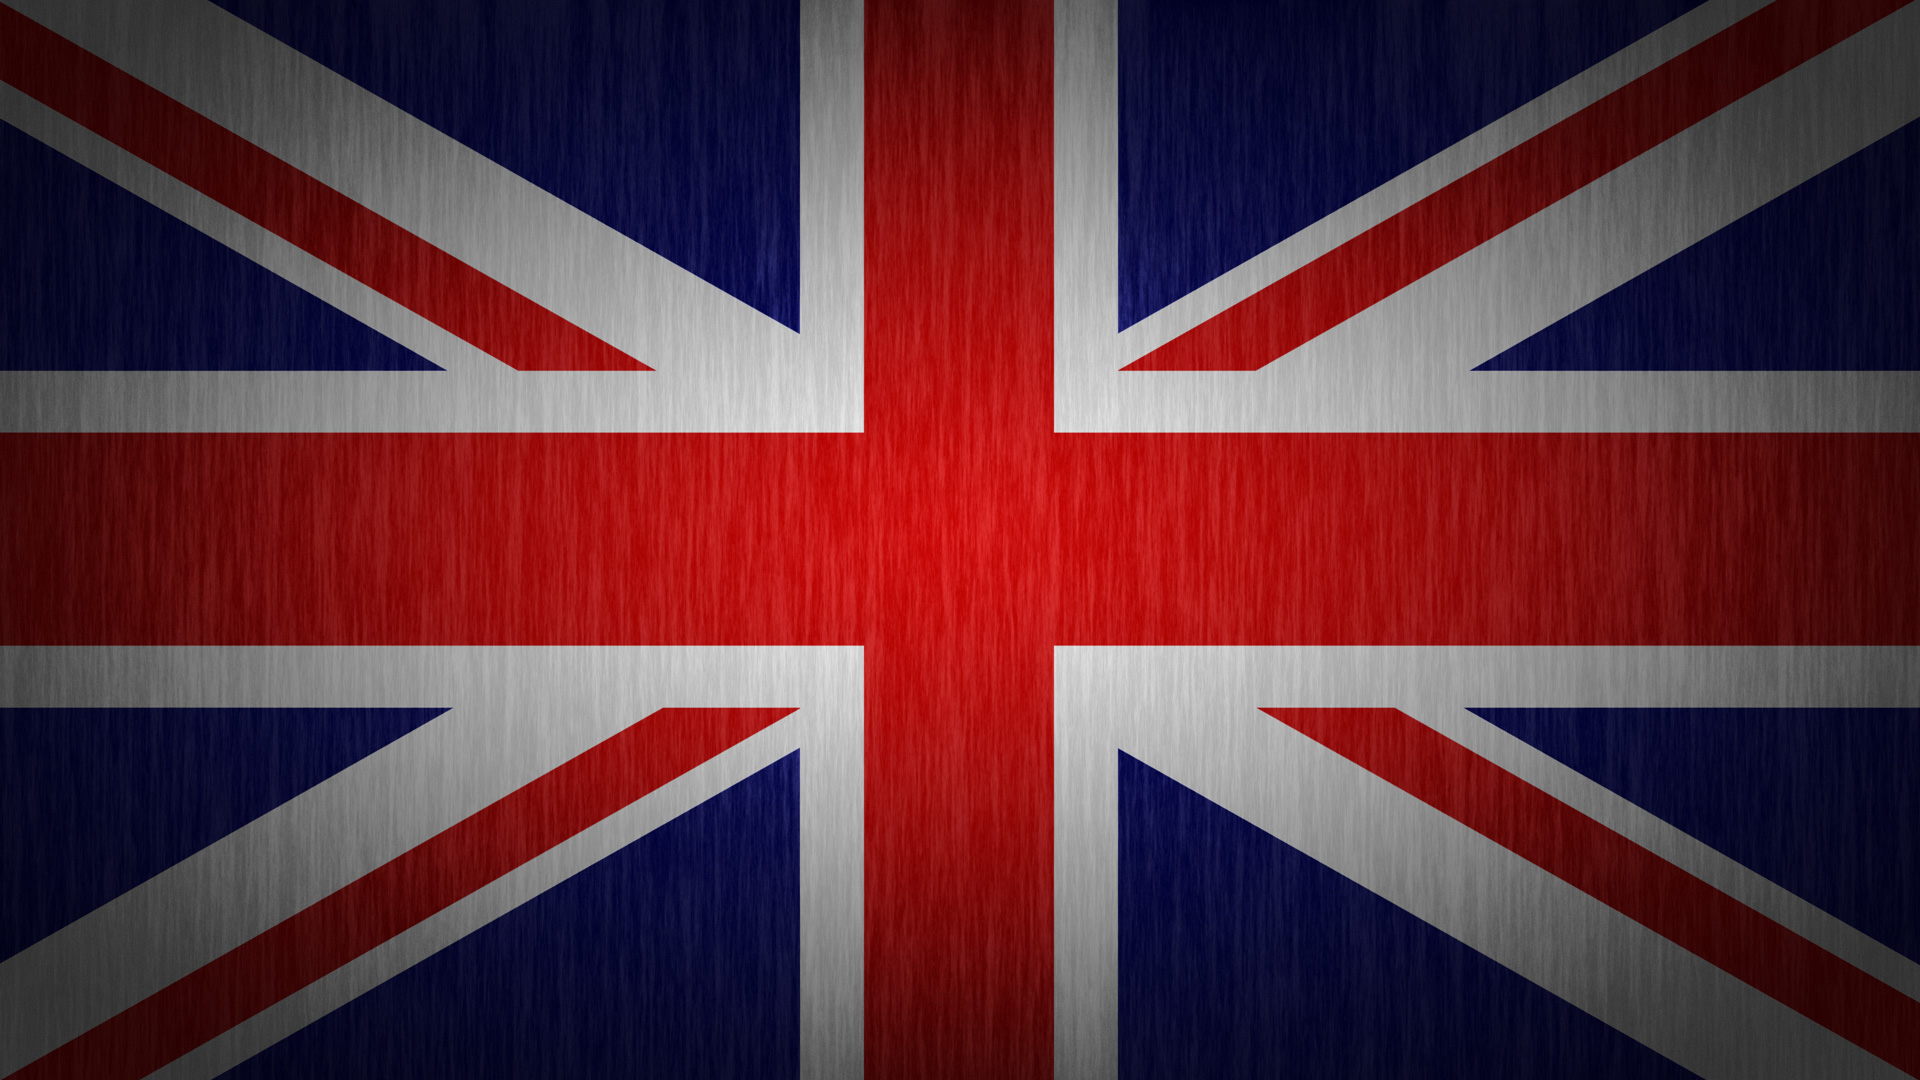 British United Kingdom Flag HD Wallpaper of Flag 1920x1080